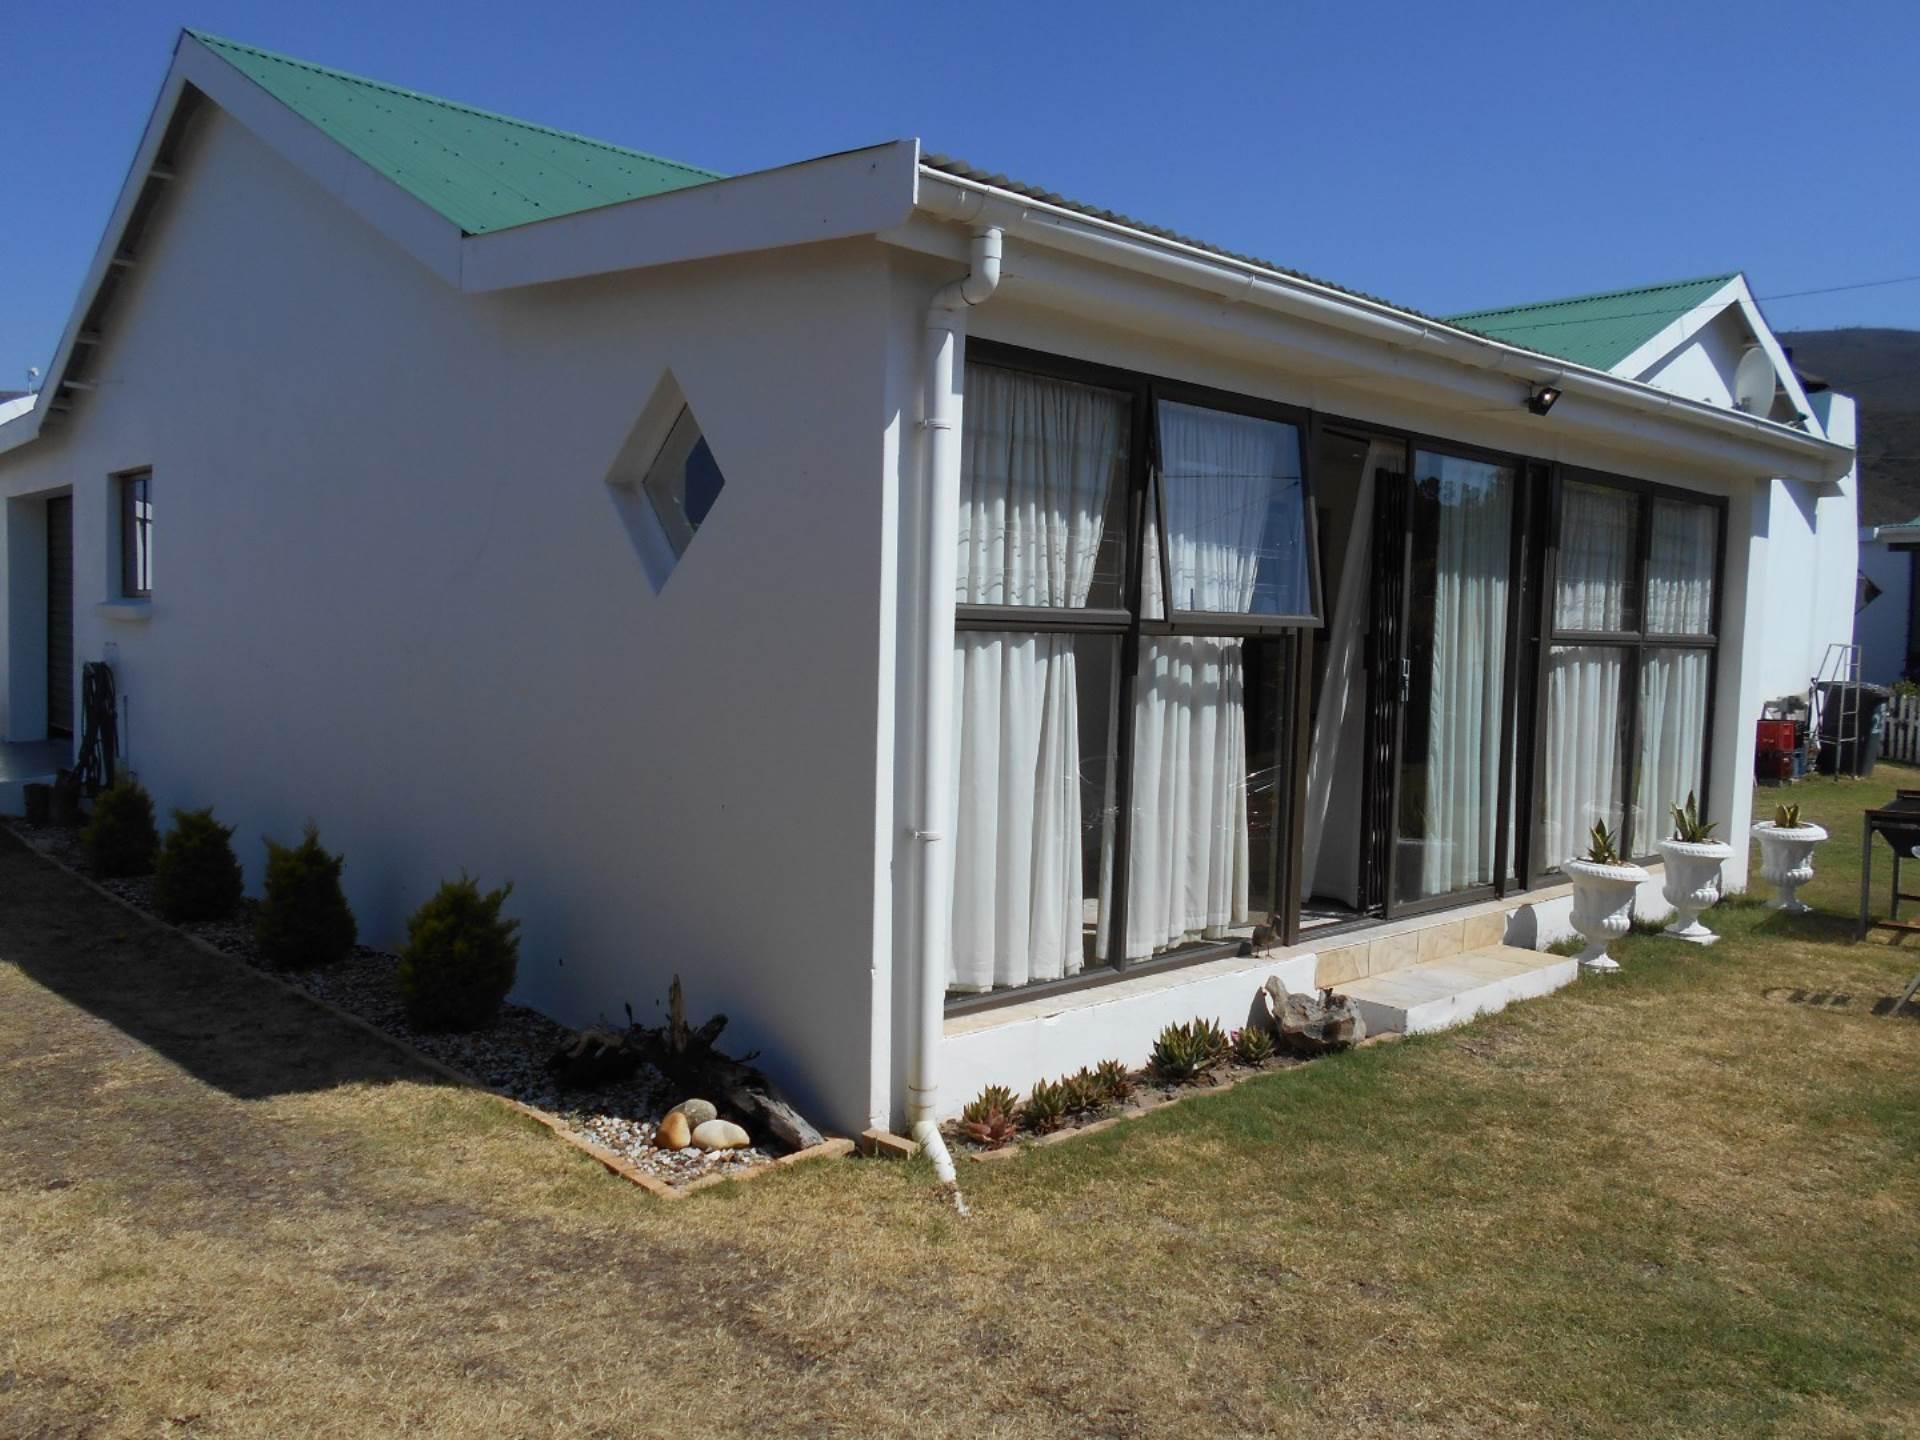 2 BedroomHouse For Sale In Sandbaai